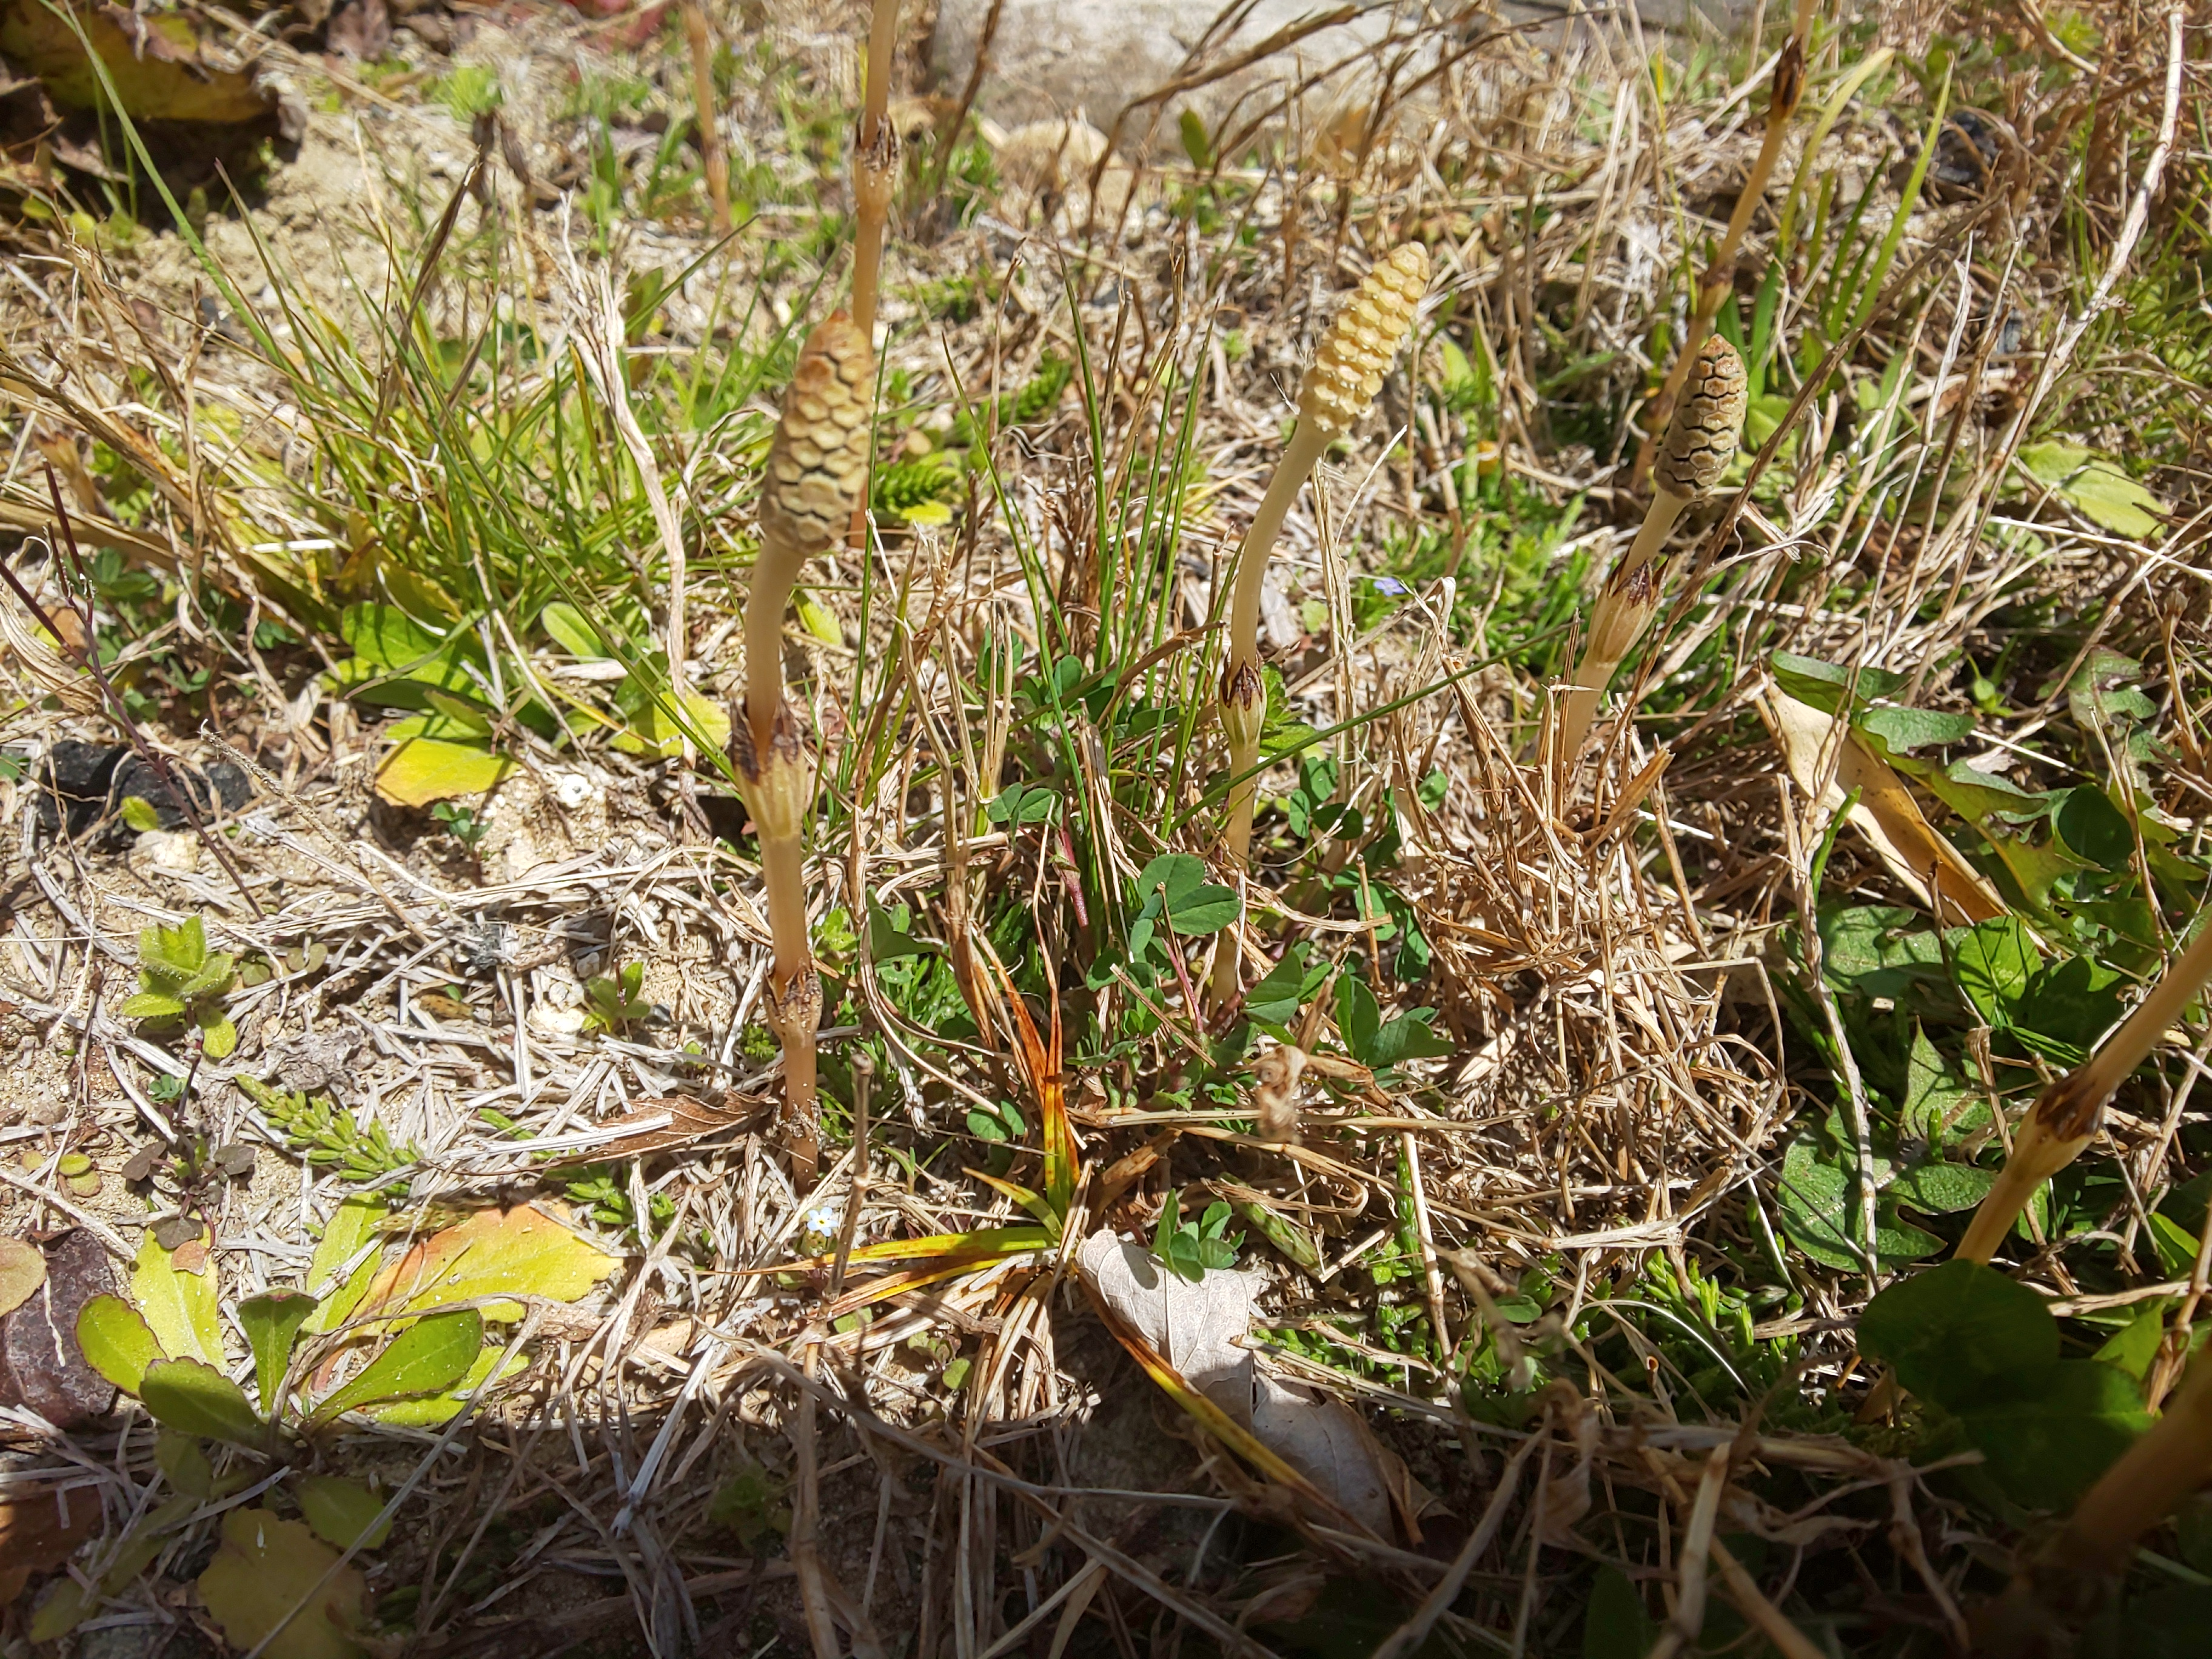 DSC_2965-e1585199596969 春の訪れ「ヒュウガミズキ」の花が咲きはじめました